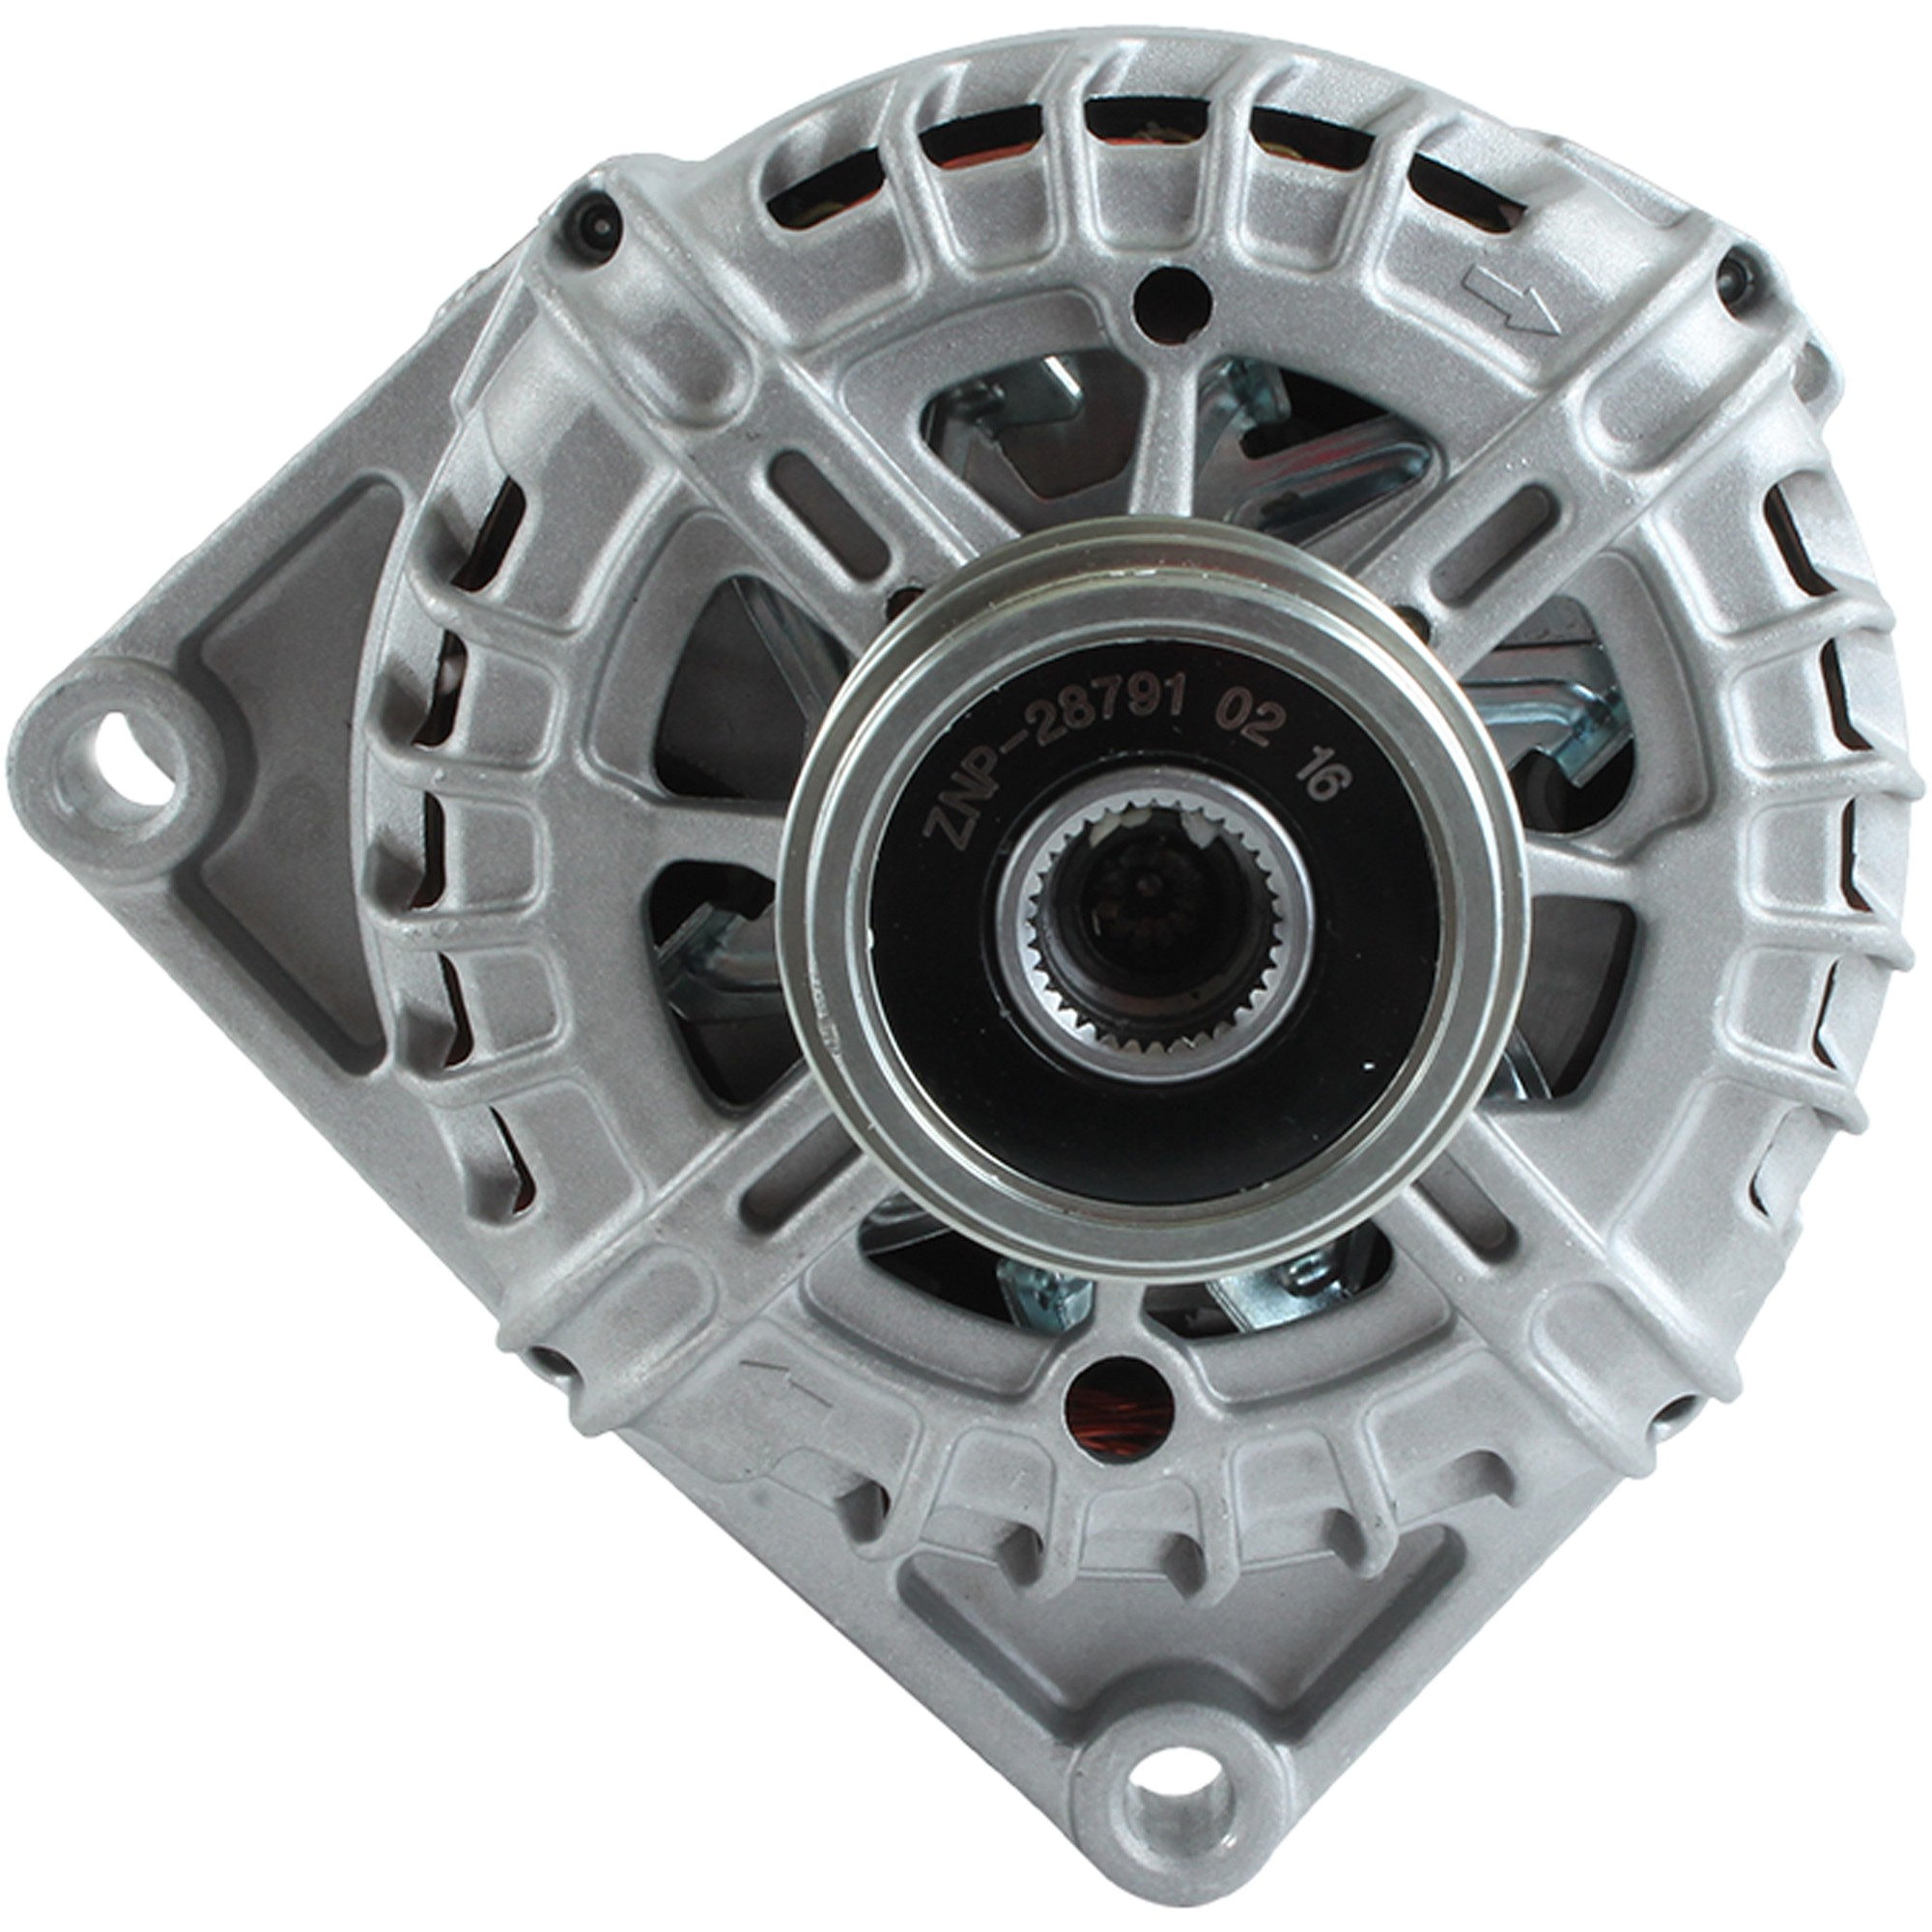 DB Electrical AVA0137 New Alternator 1.8 11 13 14 15 Chevrolet Cruze 16 2016 IR//IF 12-Volt 130 Amp w// 1.8L